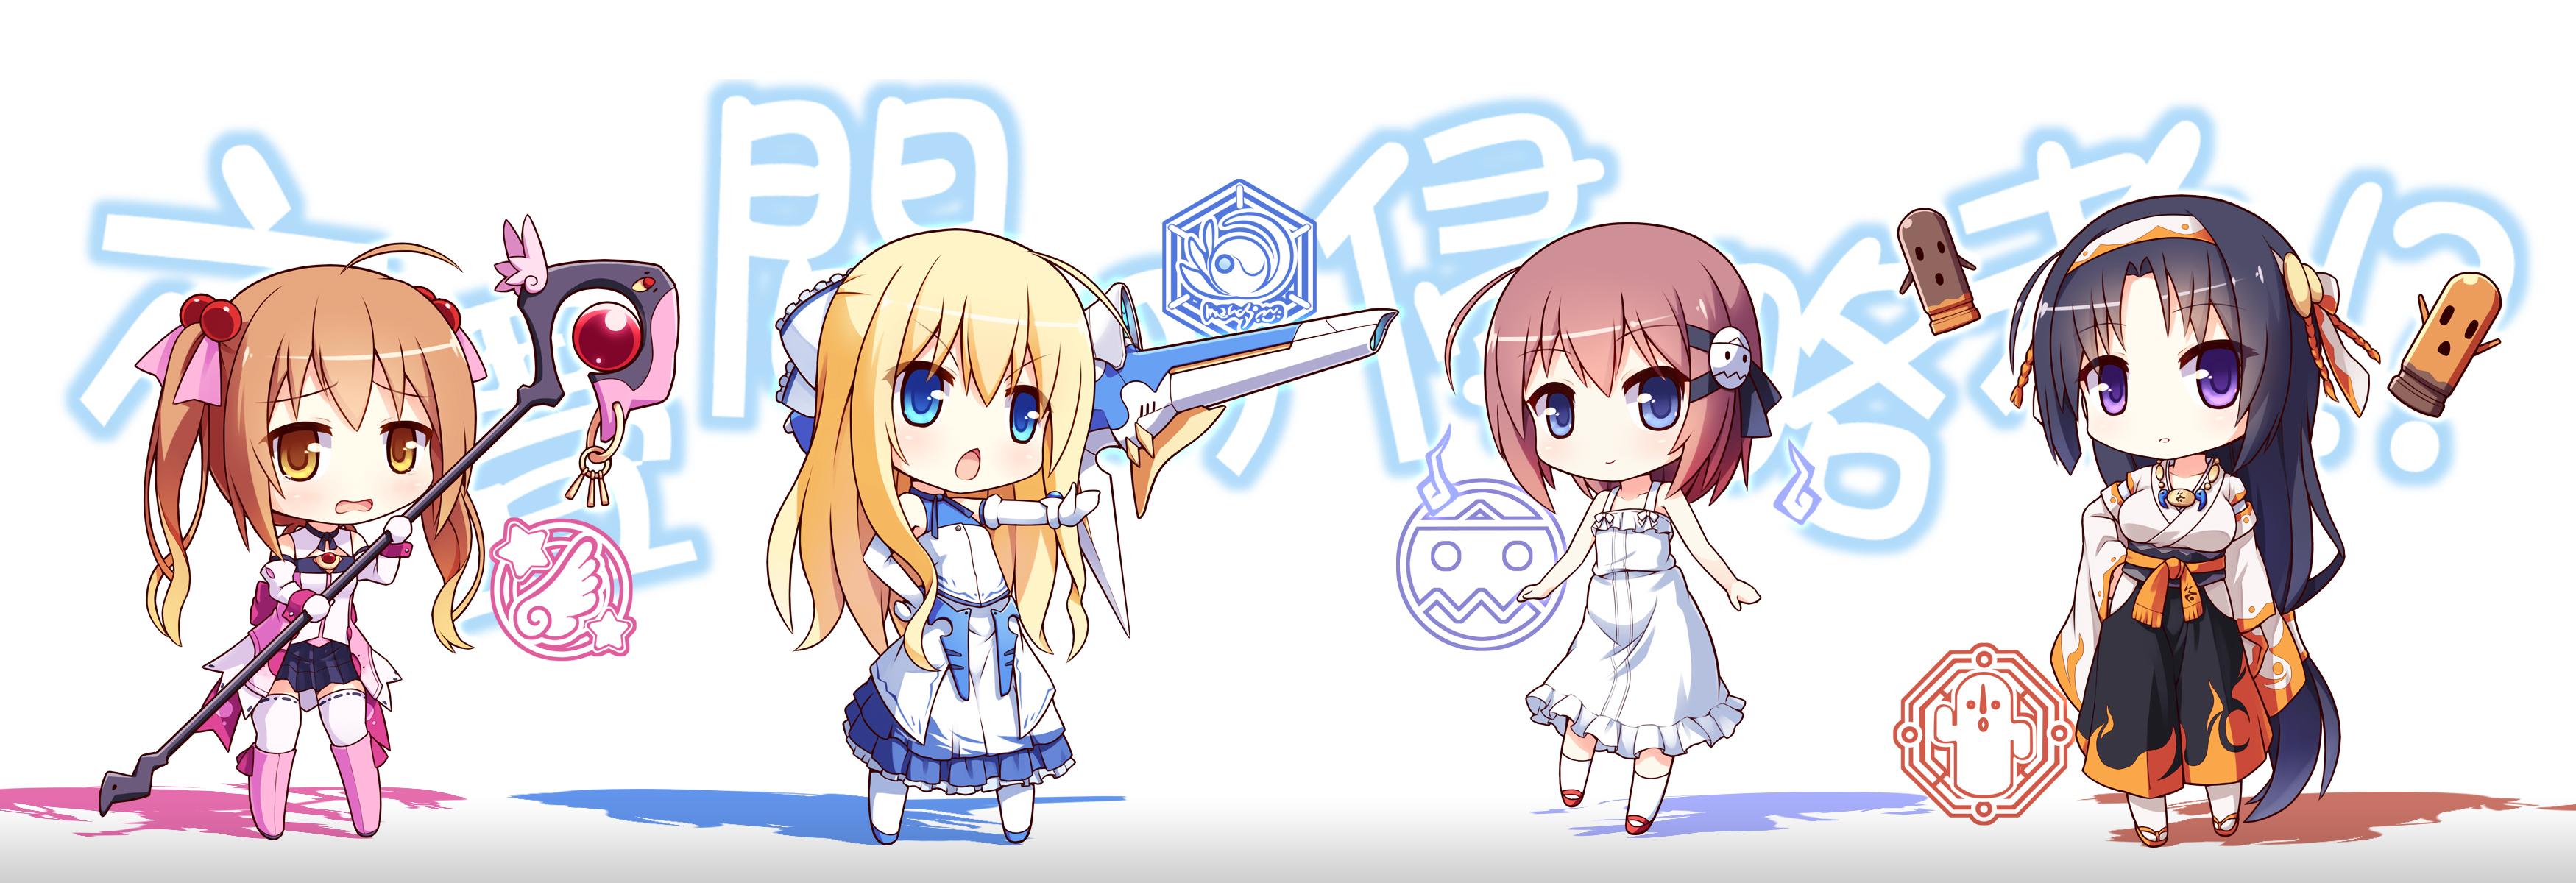 anime_wallpaper_Rokujyoma_no_Shinryakusha_langbazi-13778182.jpeg